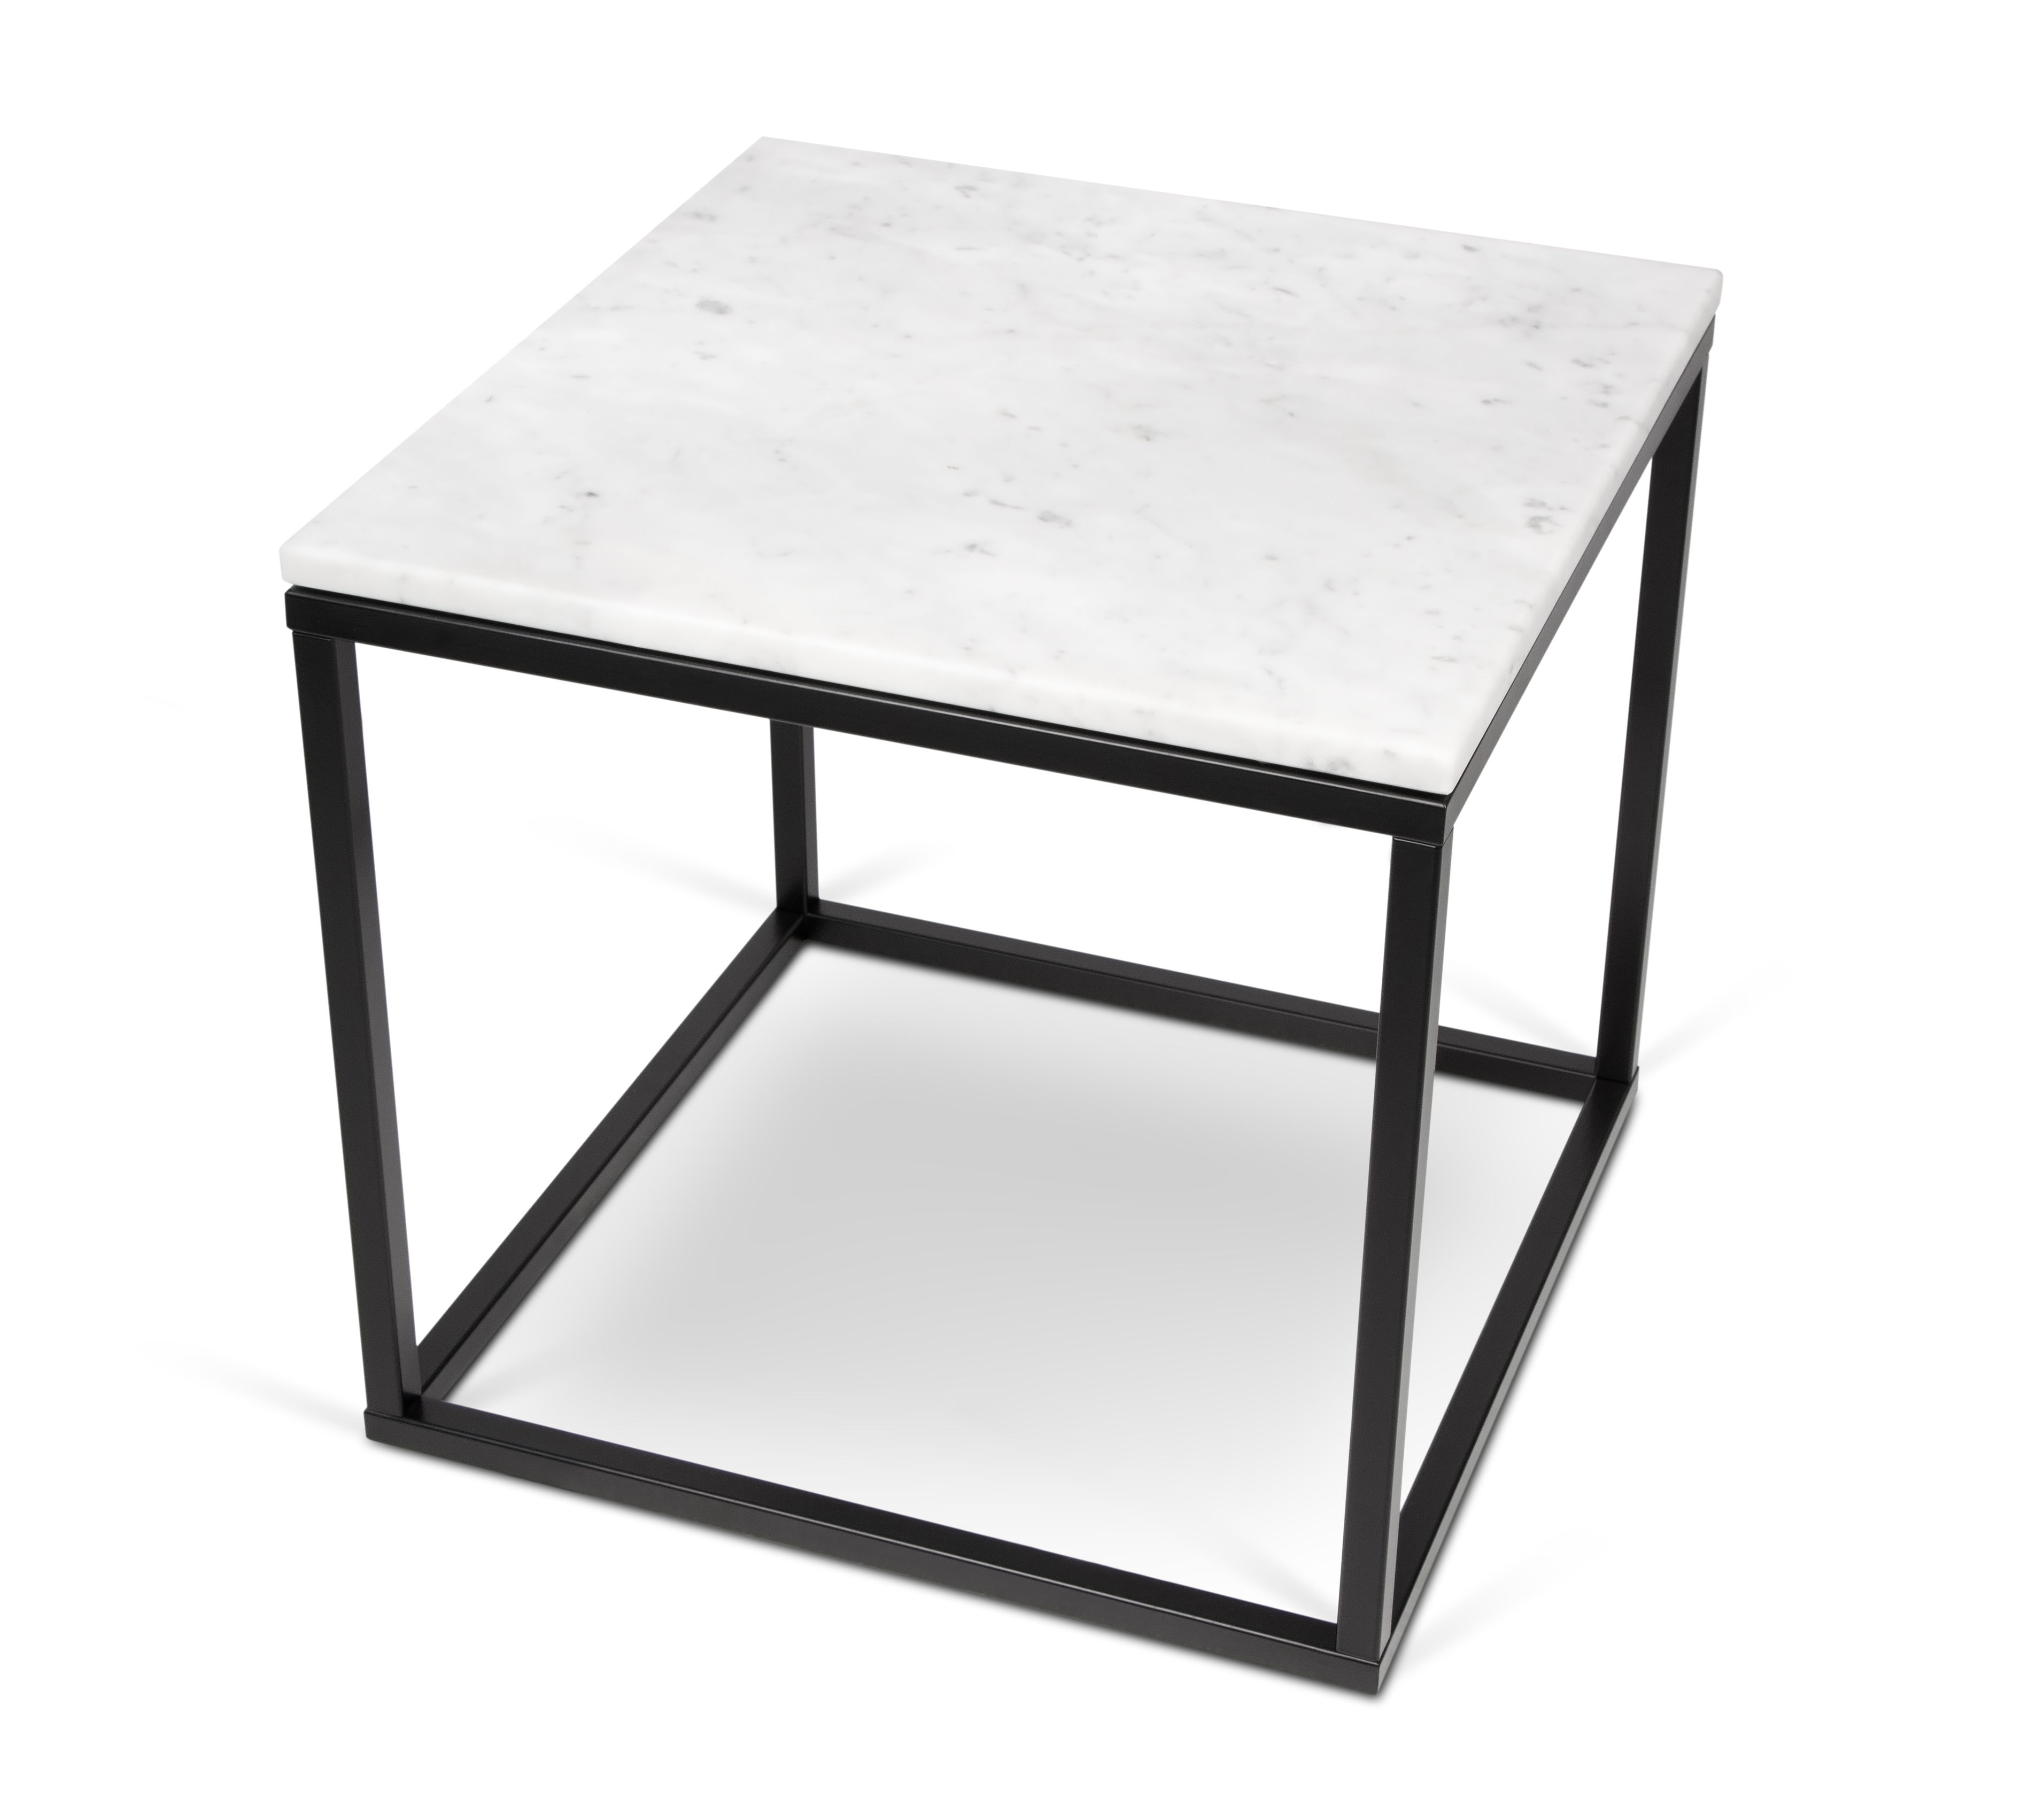 marble couchtisch marmor 50 x 50cm wei er marmor tischgestell schwarz by pop up home. Black Bedroom Furniture Sets. Home Design Ideas